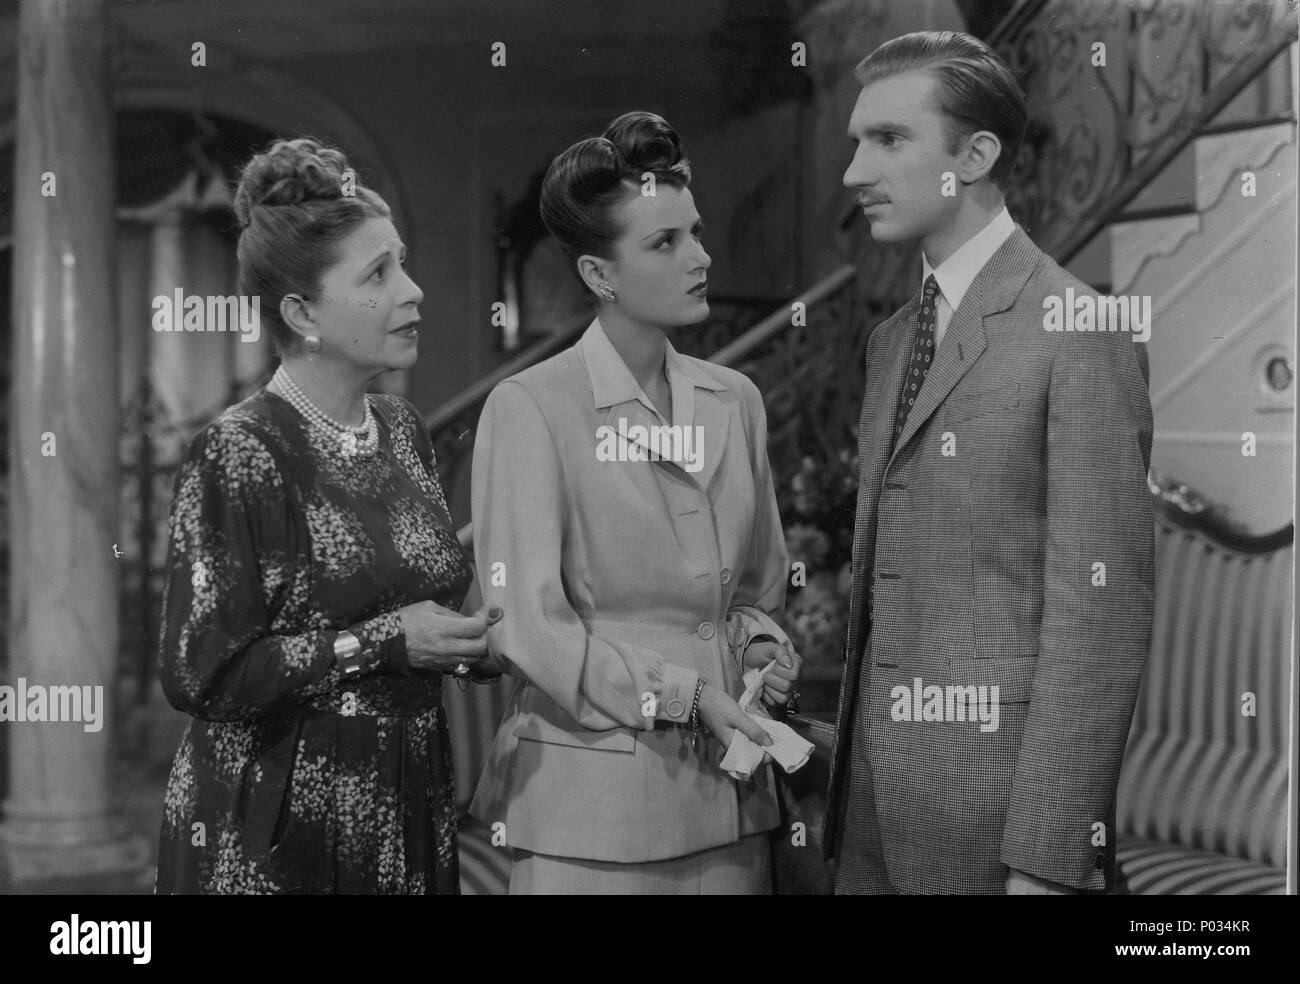 Original Film Title: ES PELIGROSO ASOMARSE AL EXTERIOR.  English Title: ES PELIGROSO ASOMARSE AL EXTERIOR.  Film Director: ALEJANDRO ULLOA.  Year: 1946.  Stars: FERNANDO FERNAN GOMEZ; ANA MARIA CAMPOY; GUADALUPE SAMPEDRO. Stock Photo